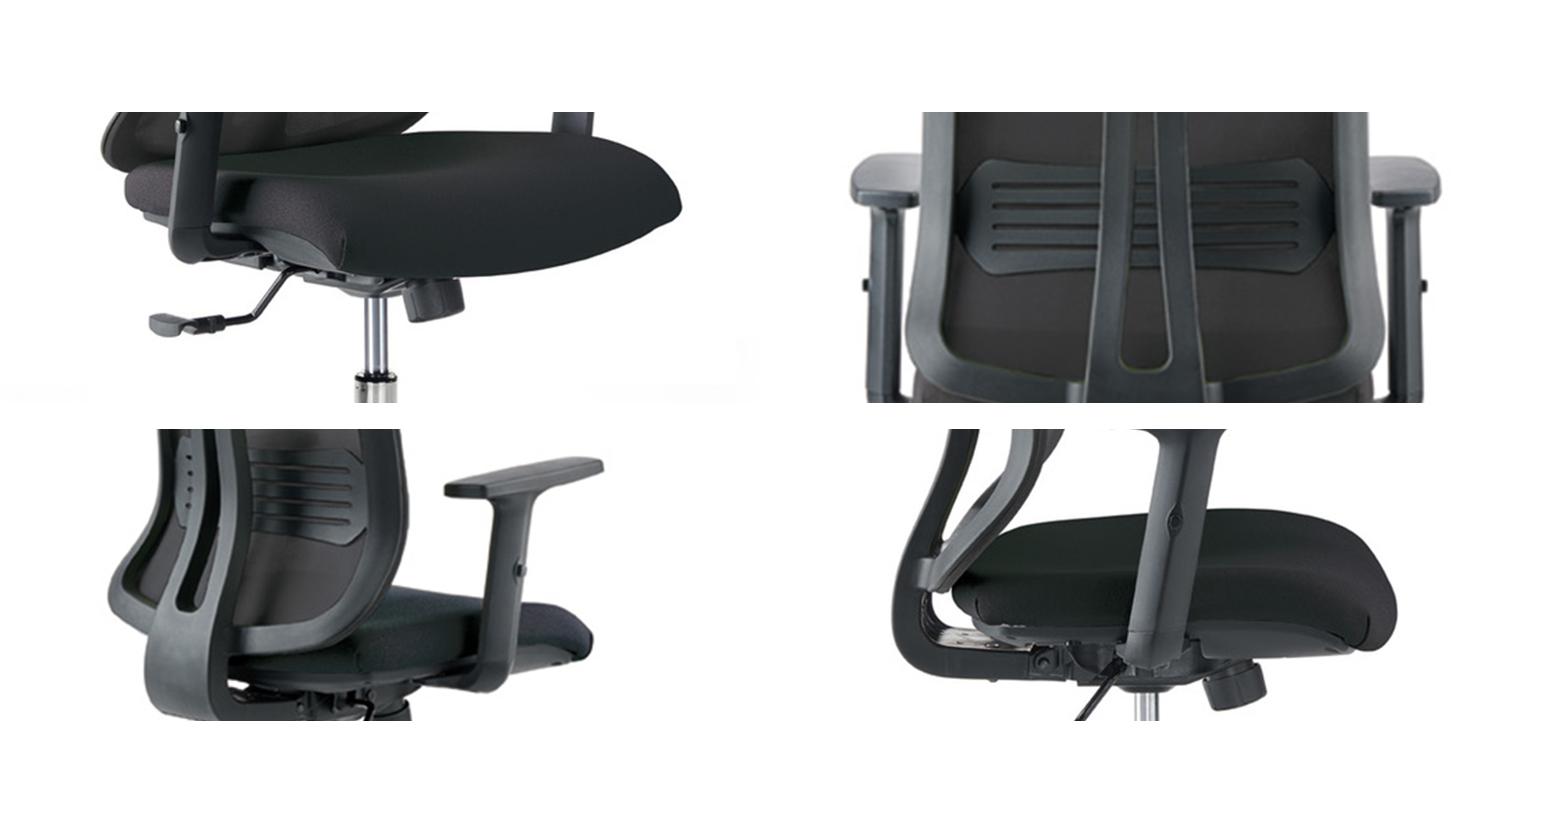 Vertigo mecanism, brate, suport lombar, translație șezut